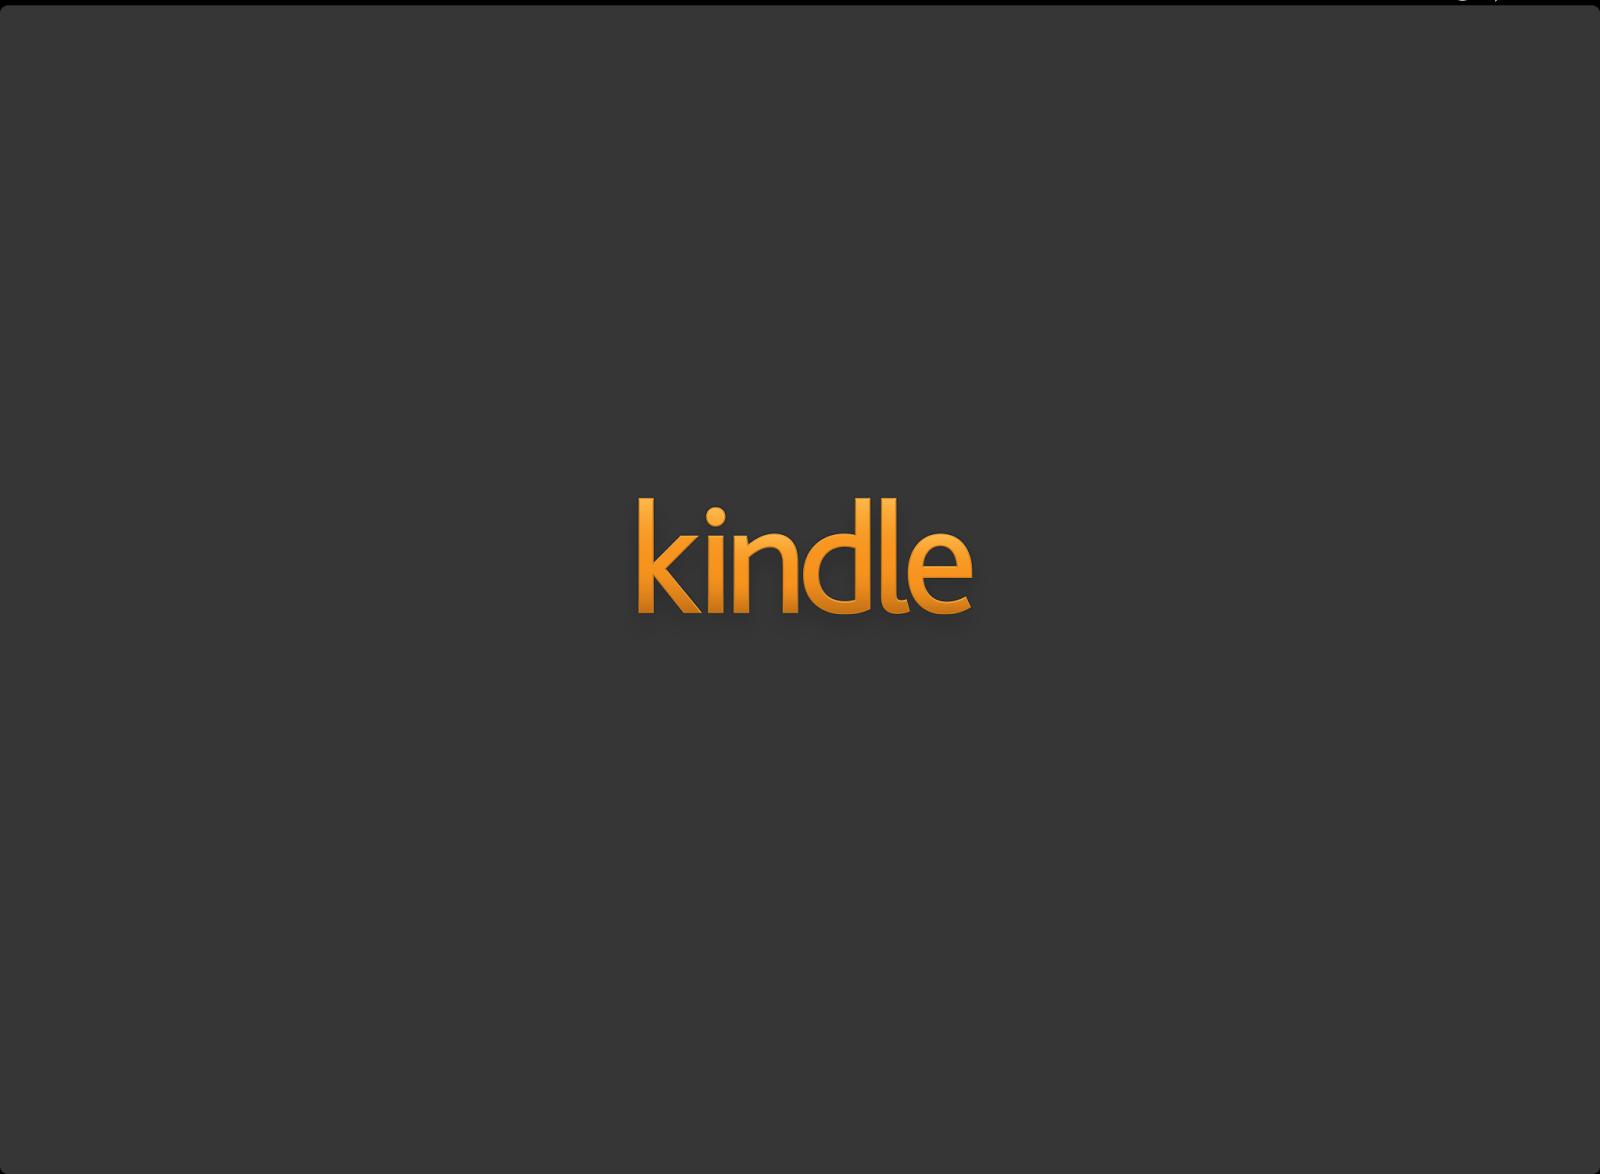 kindle-opening-scene キンドルオープニング画面